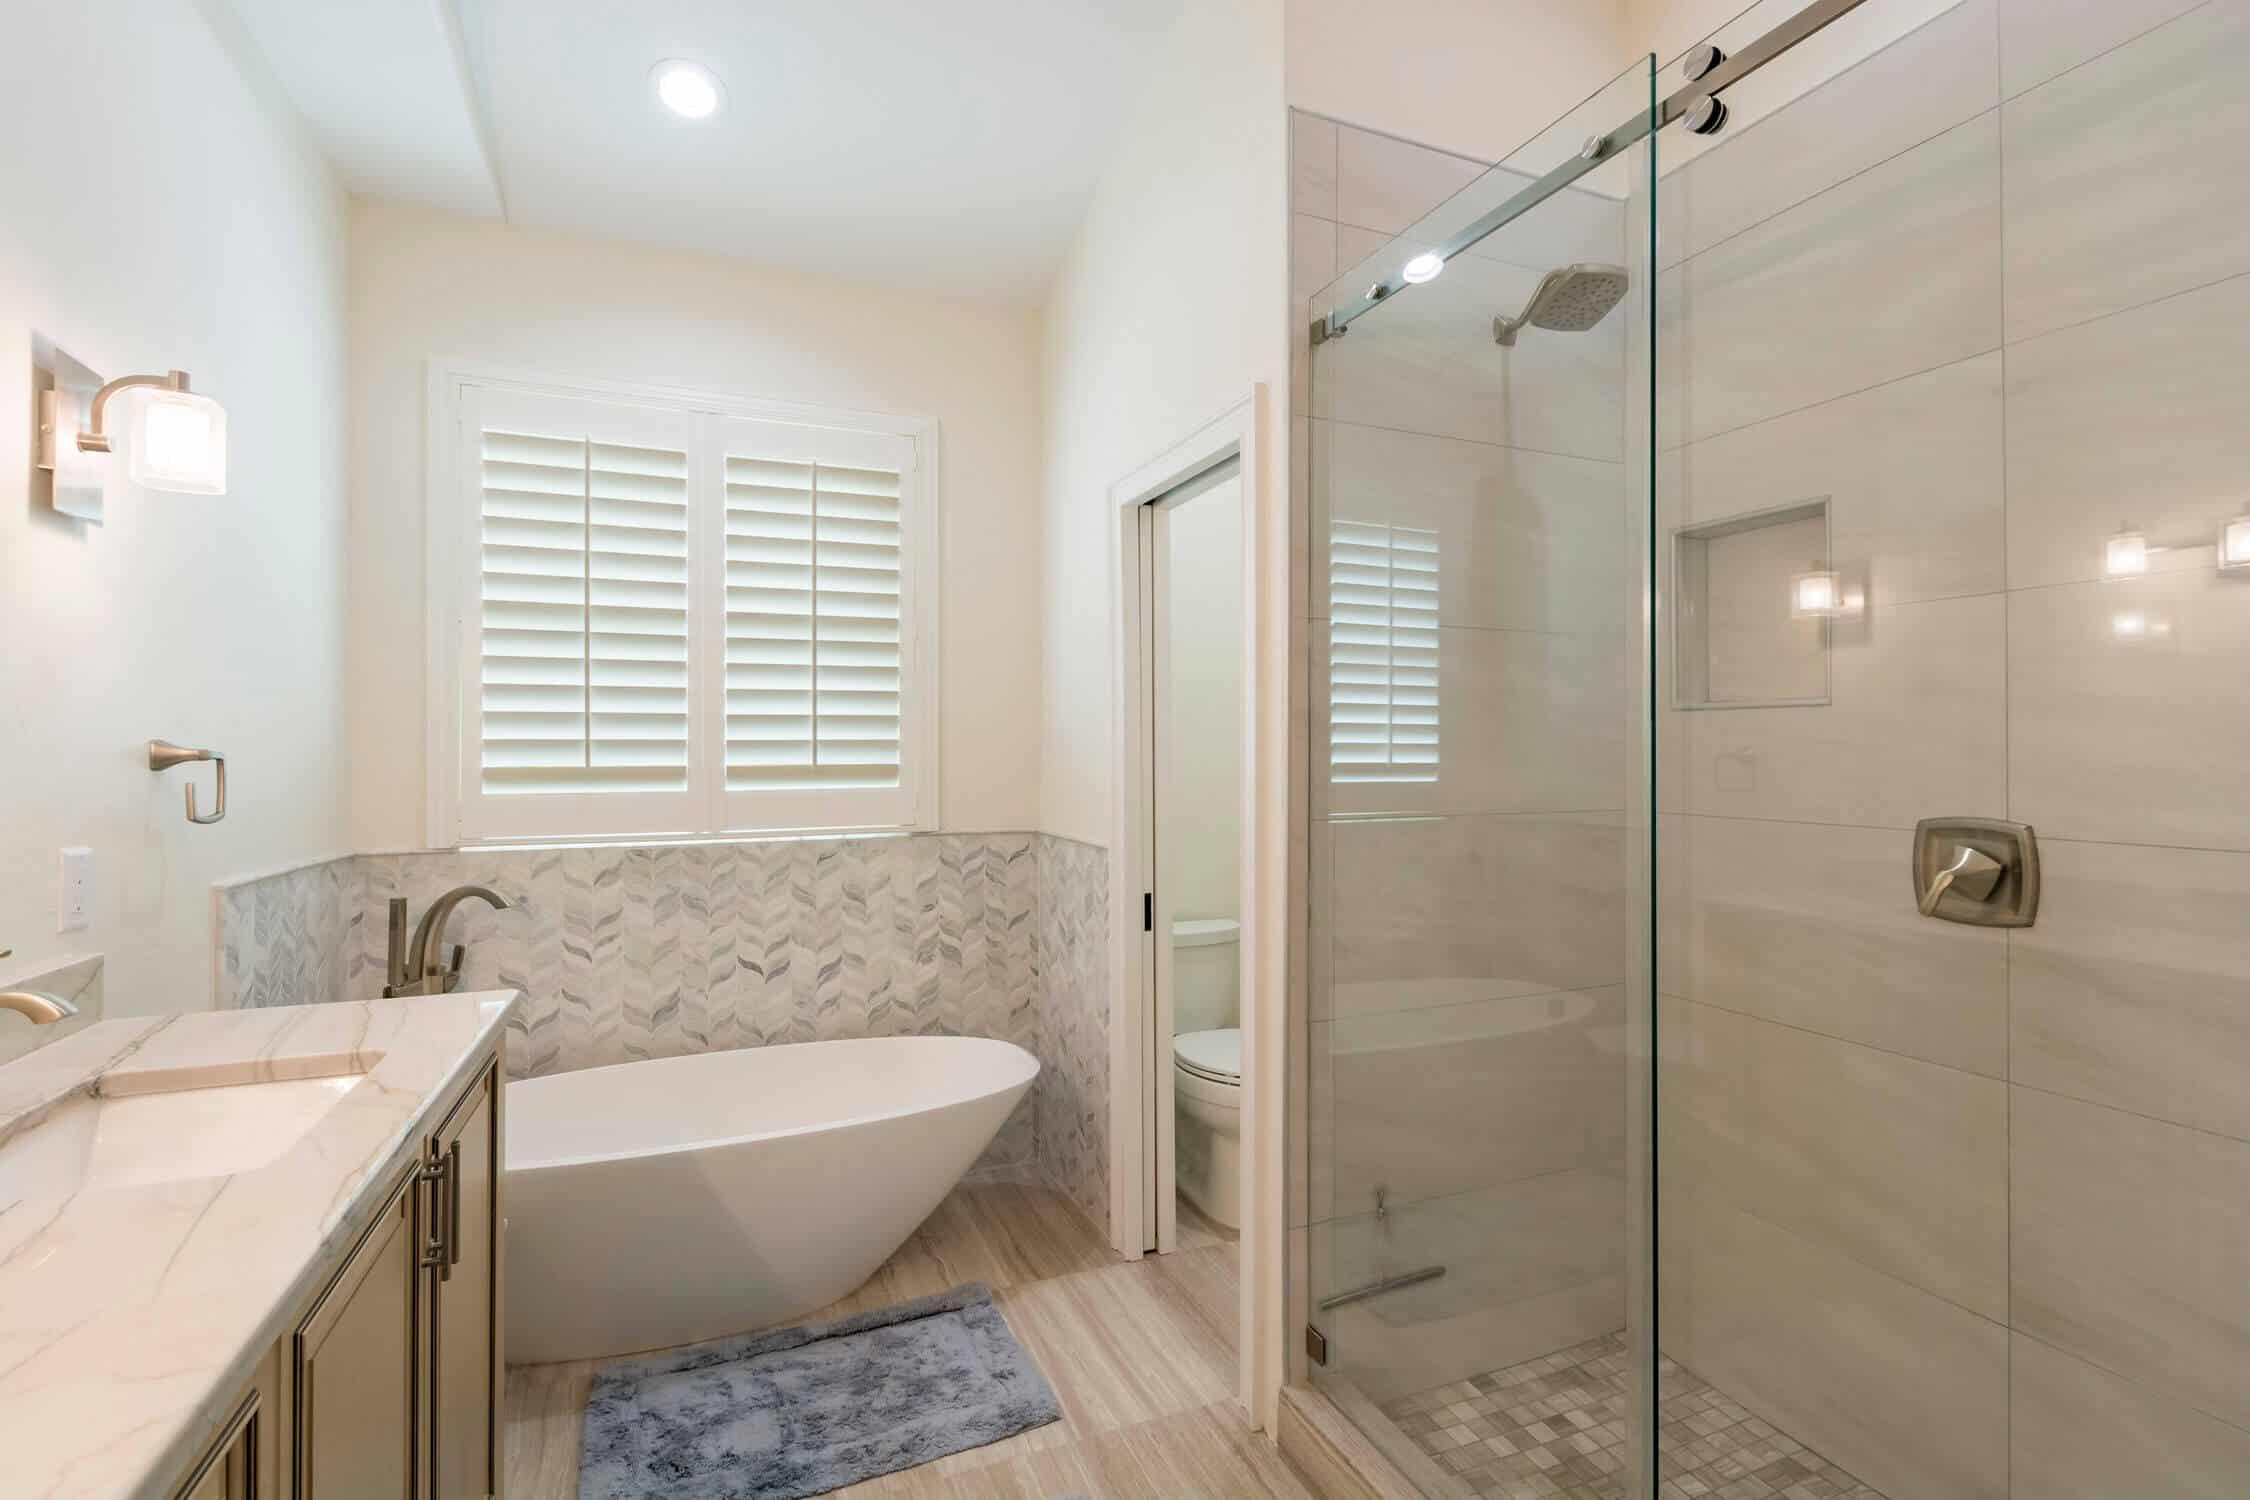 House Remodel Bathroom